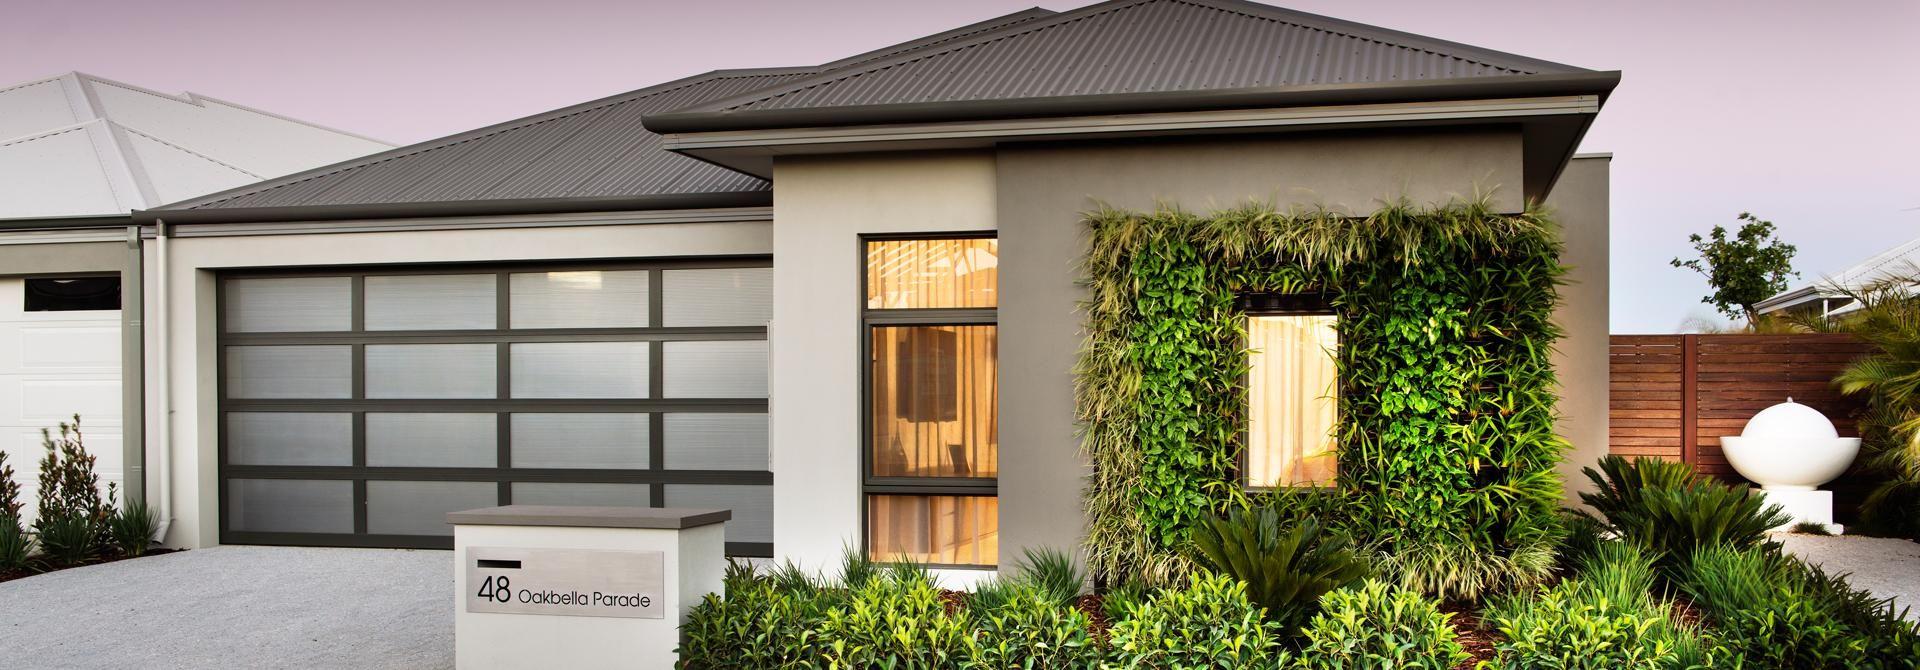 Botanica Display Home Elevation Architecture